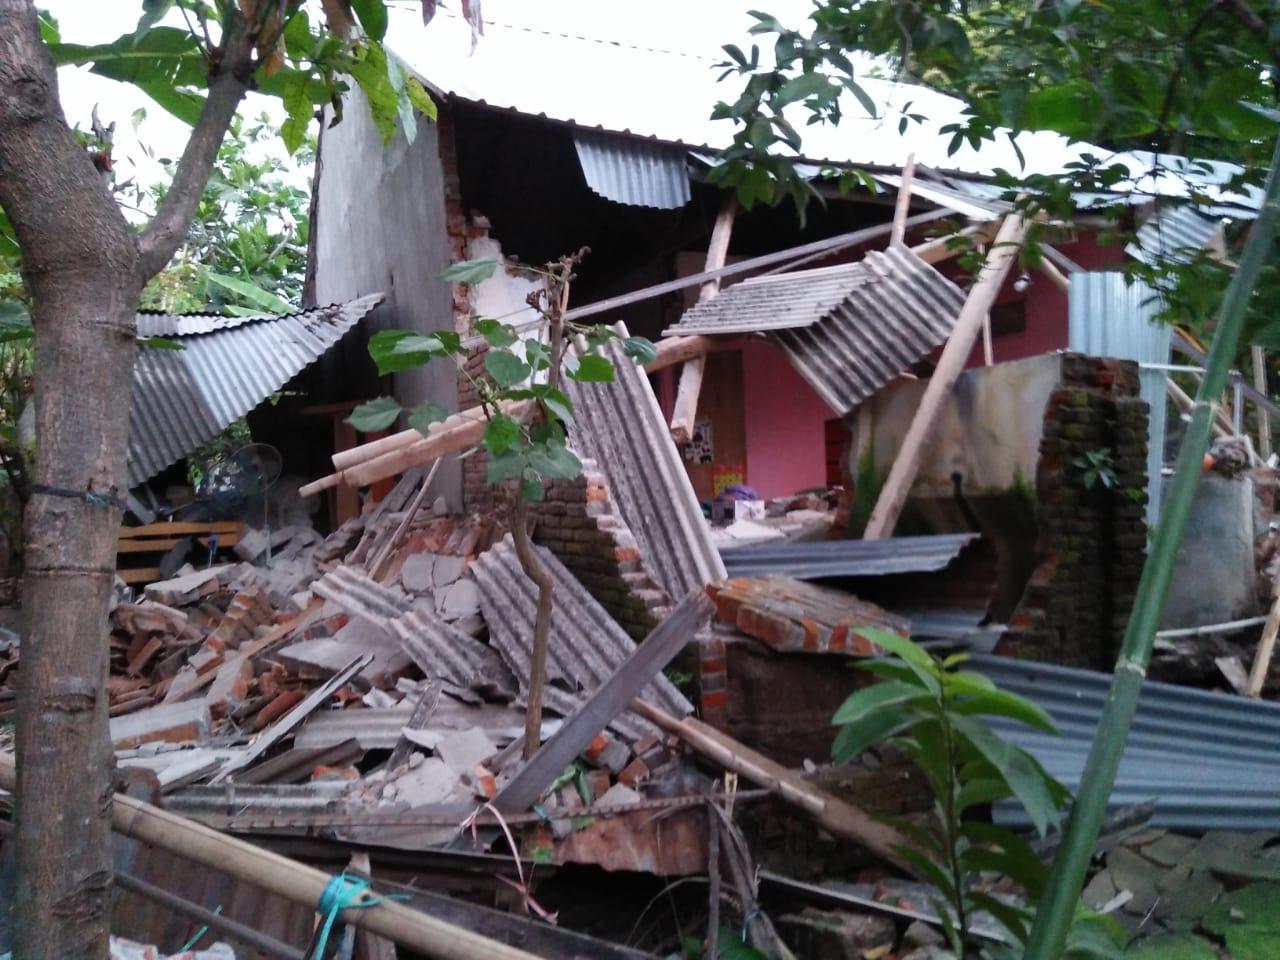 https://stichtingvlok.nl/wp-content/uploads/2018/08/West-Lombok-3.jpg